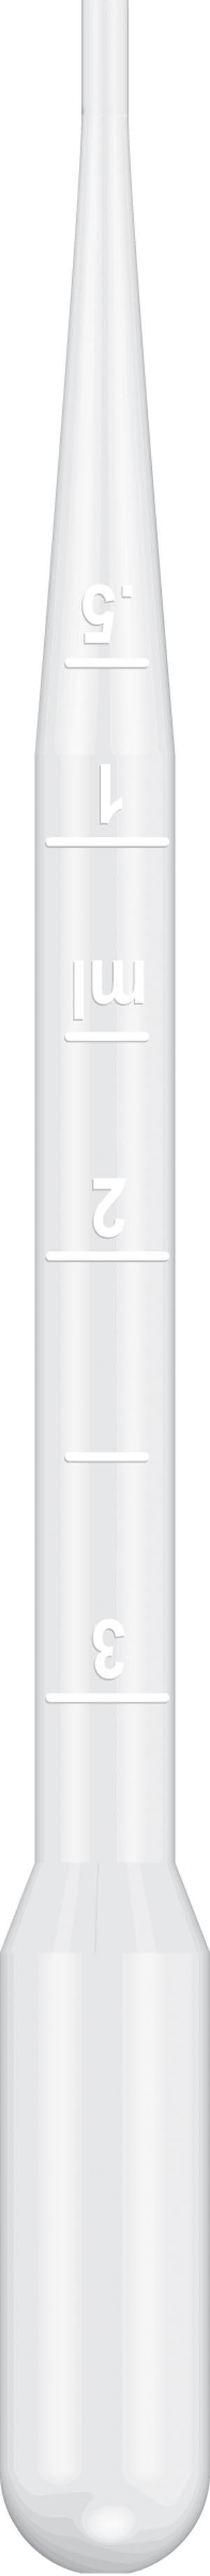 Graduated Pipet, 15.5cm Length, 7mL Capacity, Non-Sterile, 500/pk, 10 pk/cs